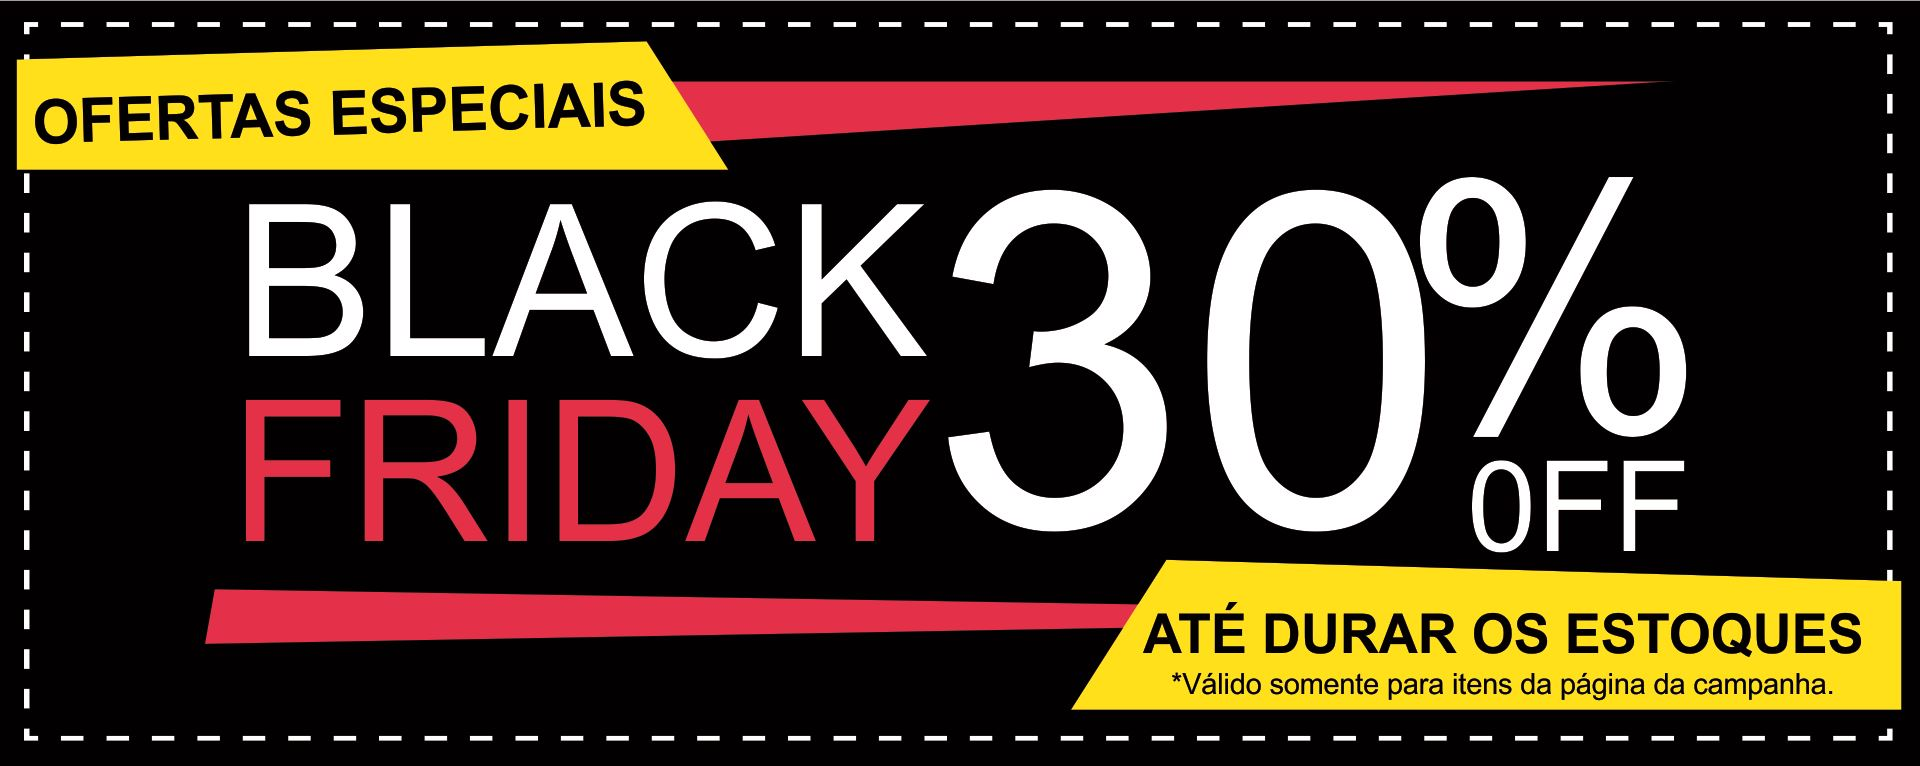 https://www.statussemijoias.com.br/promocao-black-friday